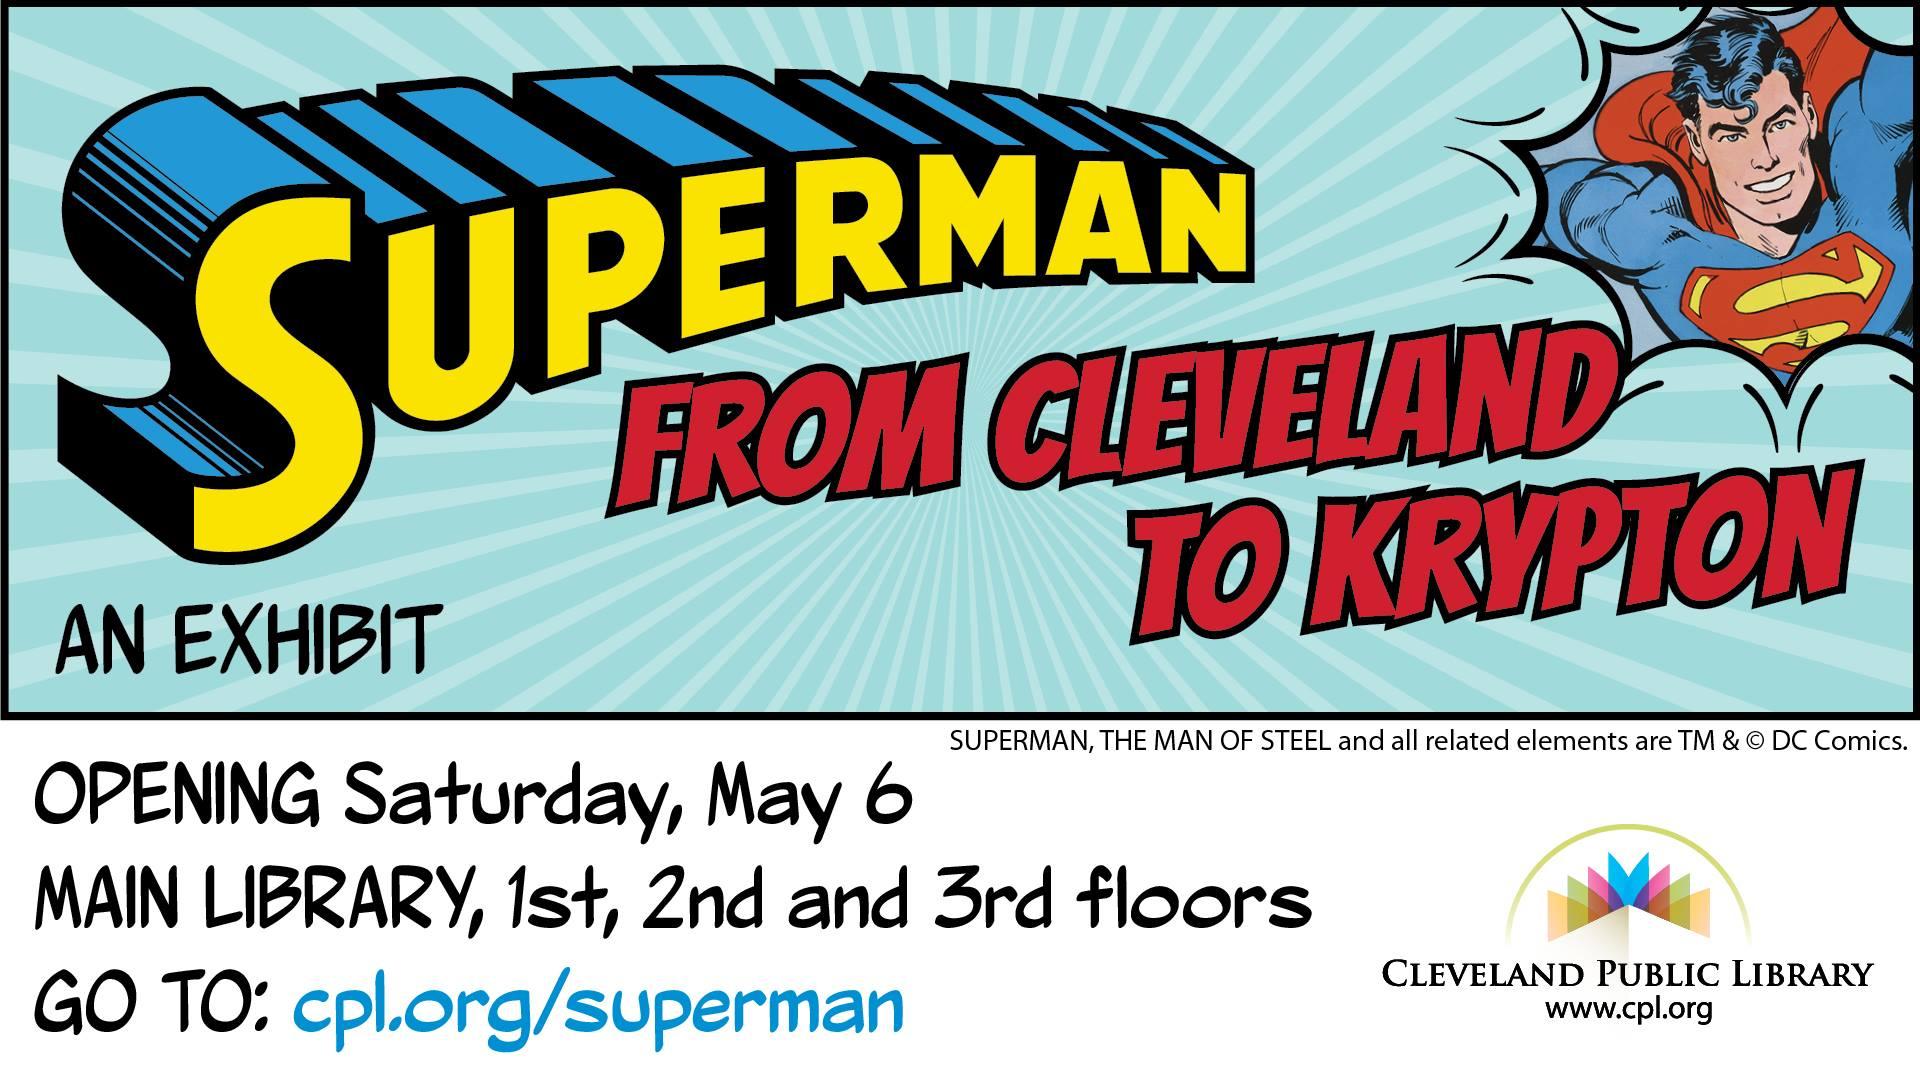 Superman Cleveland Public Library